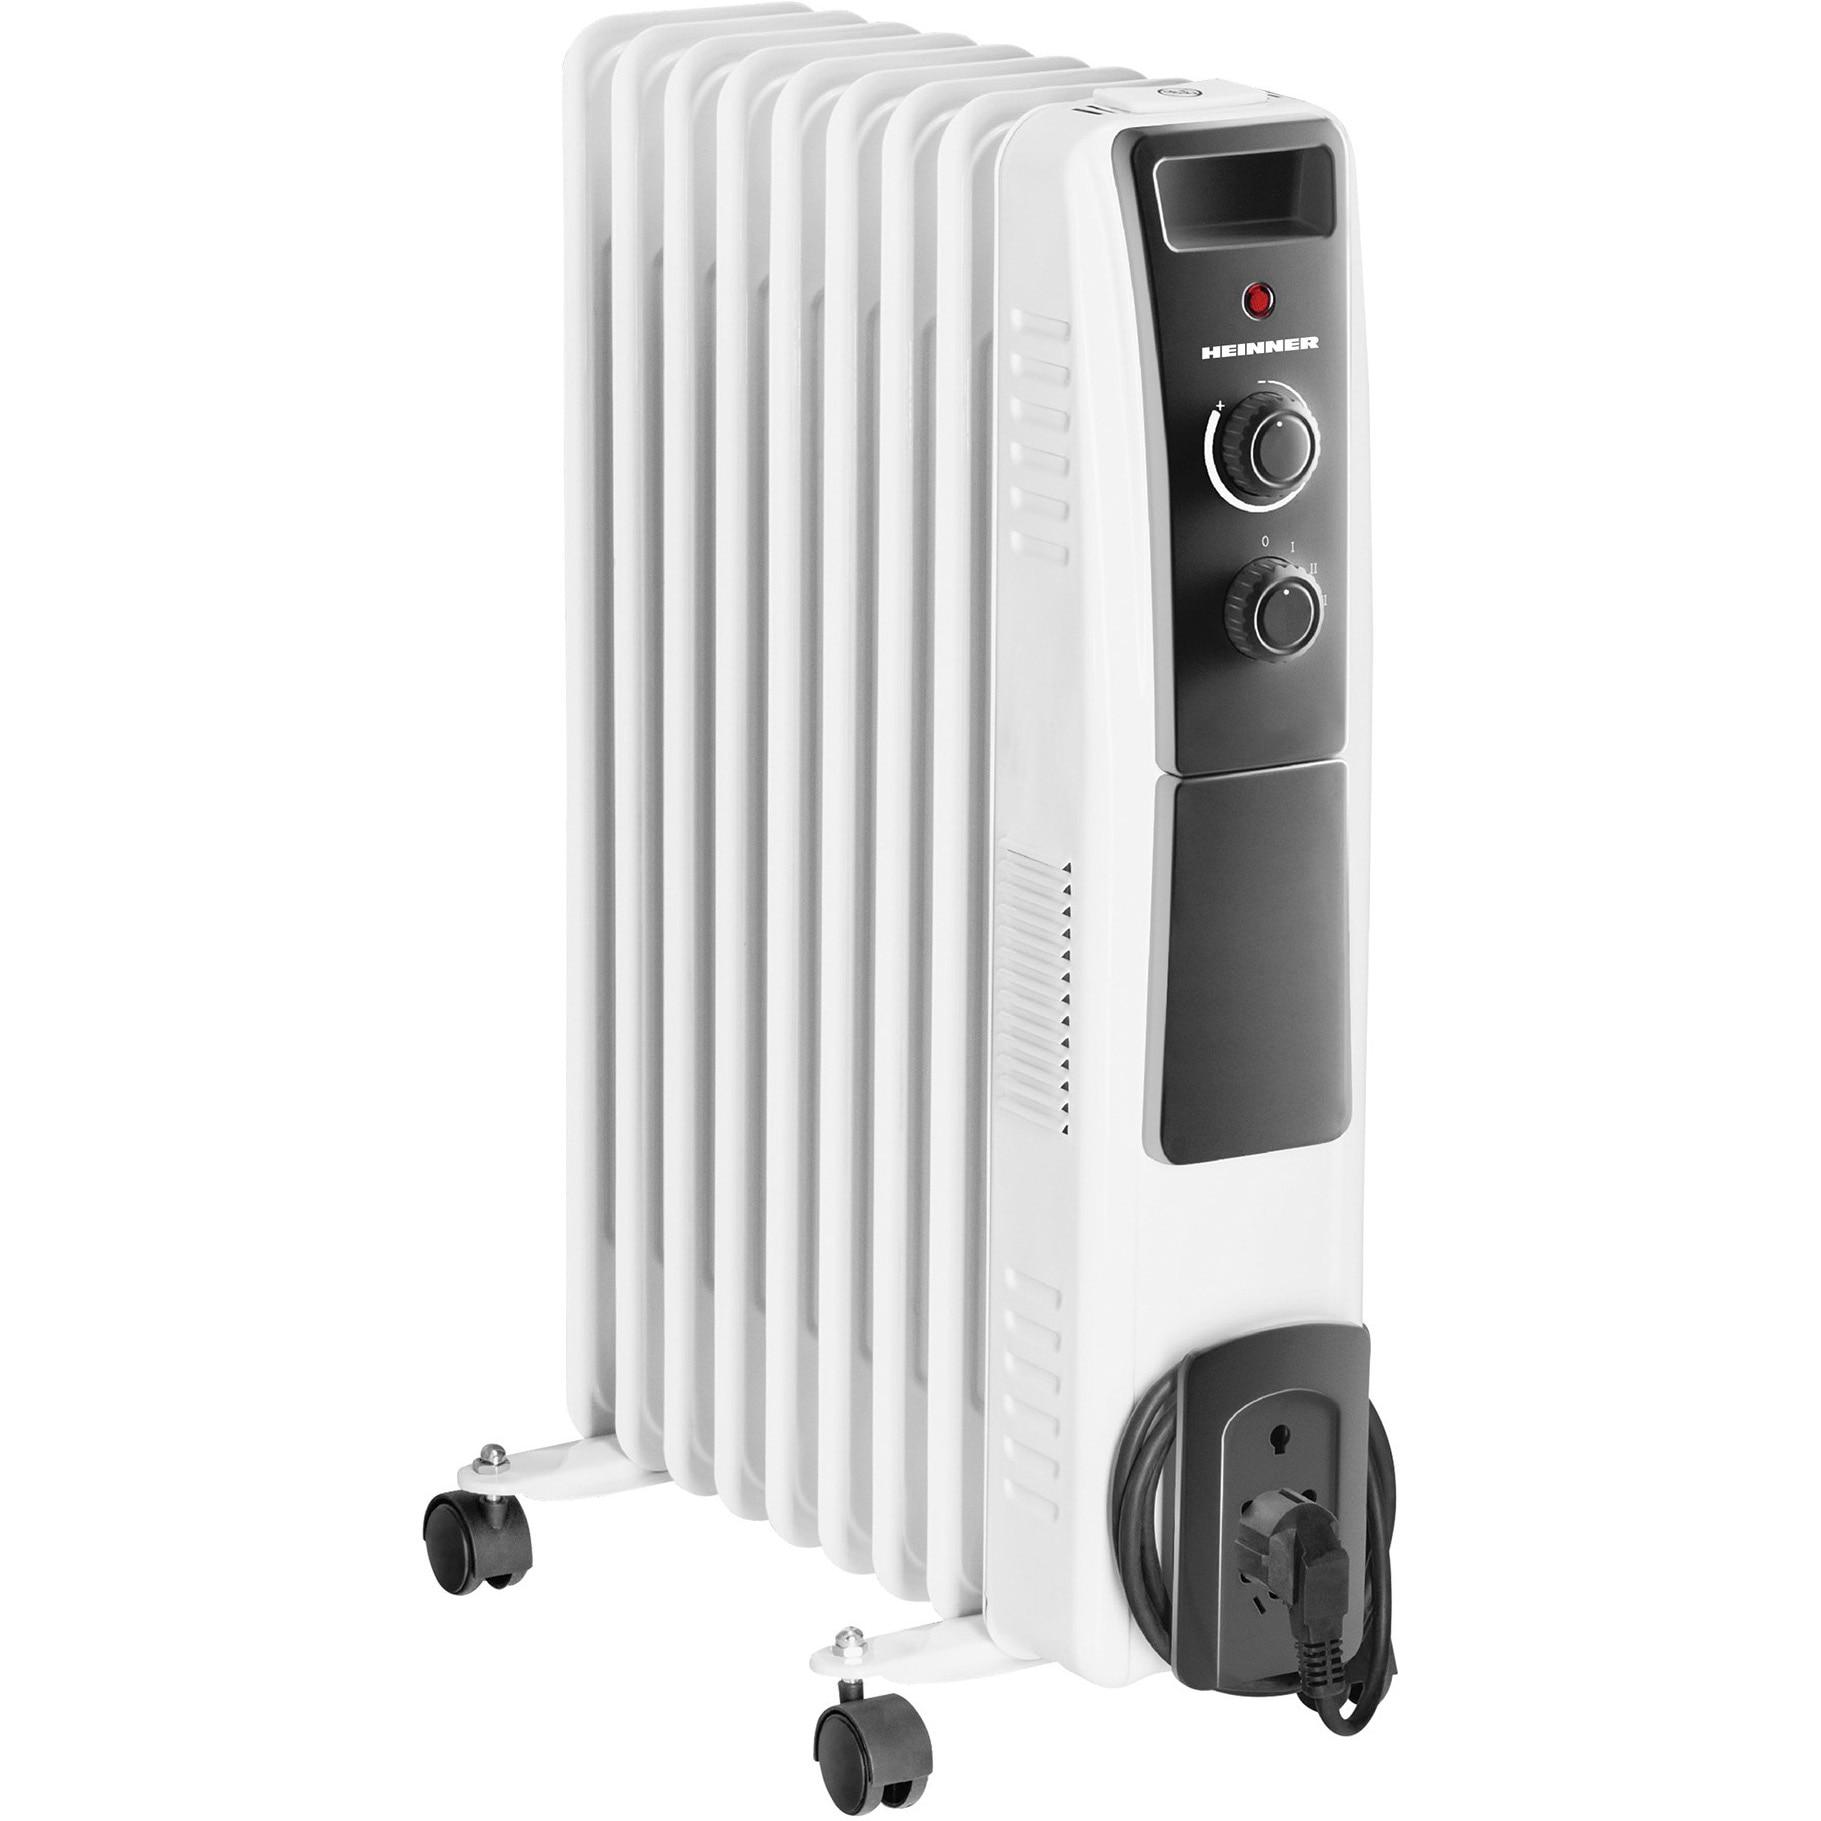 Fotografie Calorifer electric cu ulei Heinner HOH-Y09WB, 2000 W, 9 elementi, protectie supraincalzire, termostat reglabil, alb